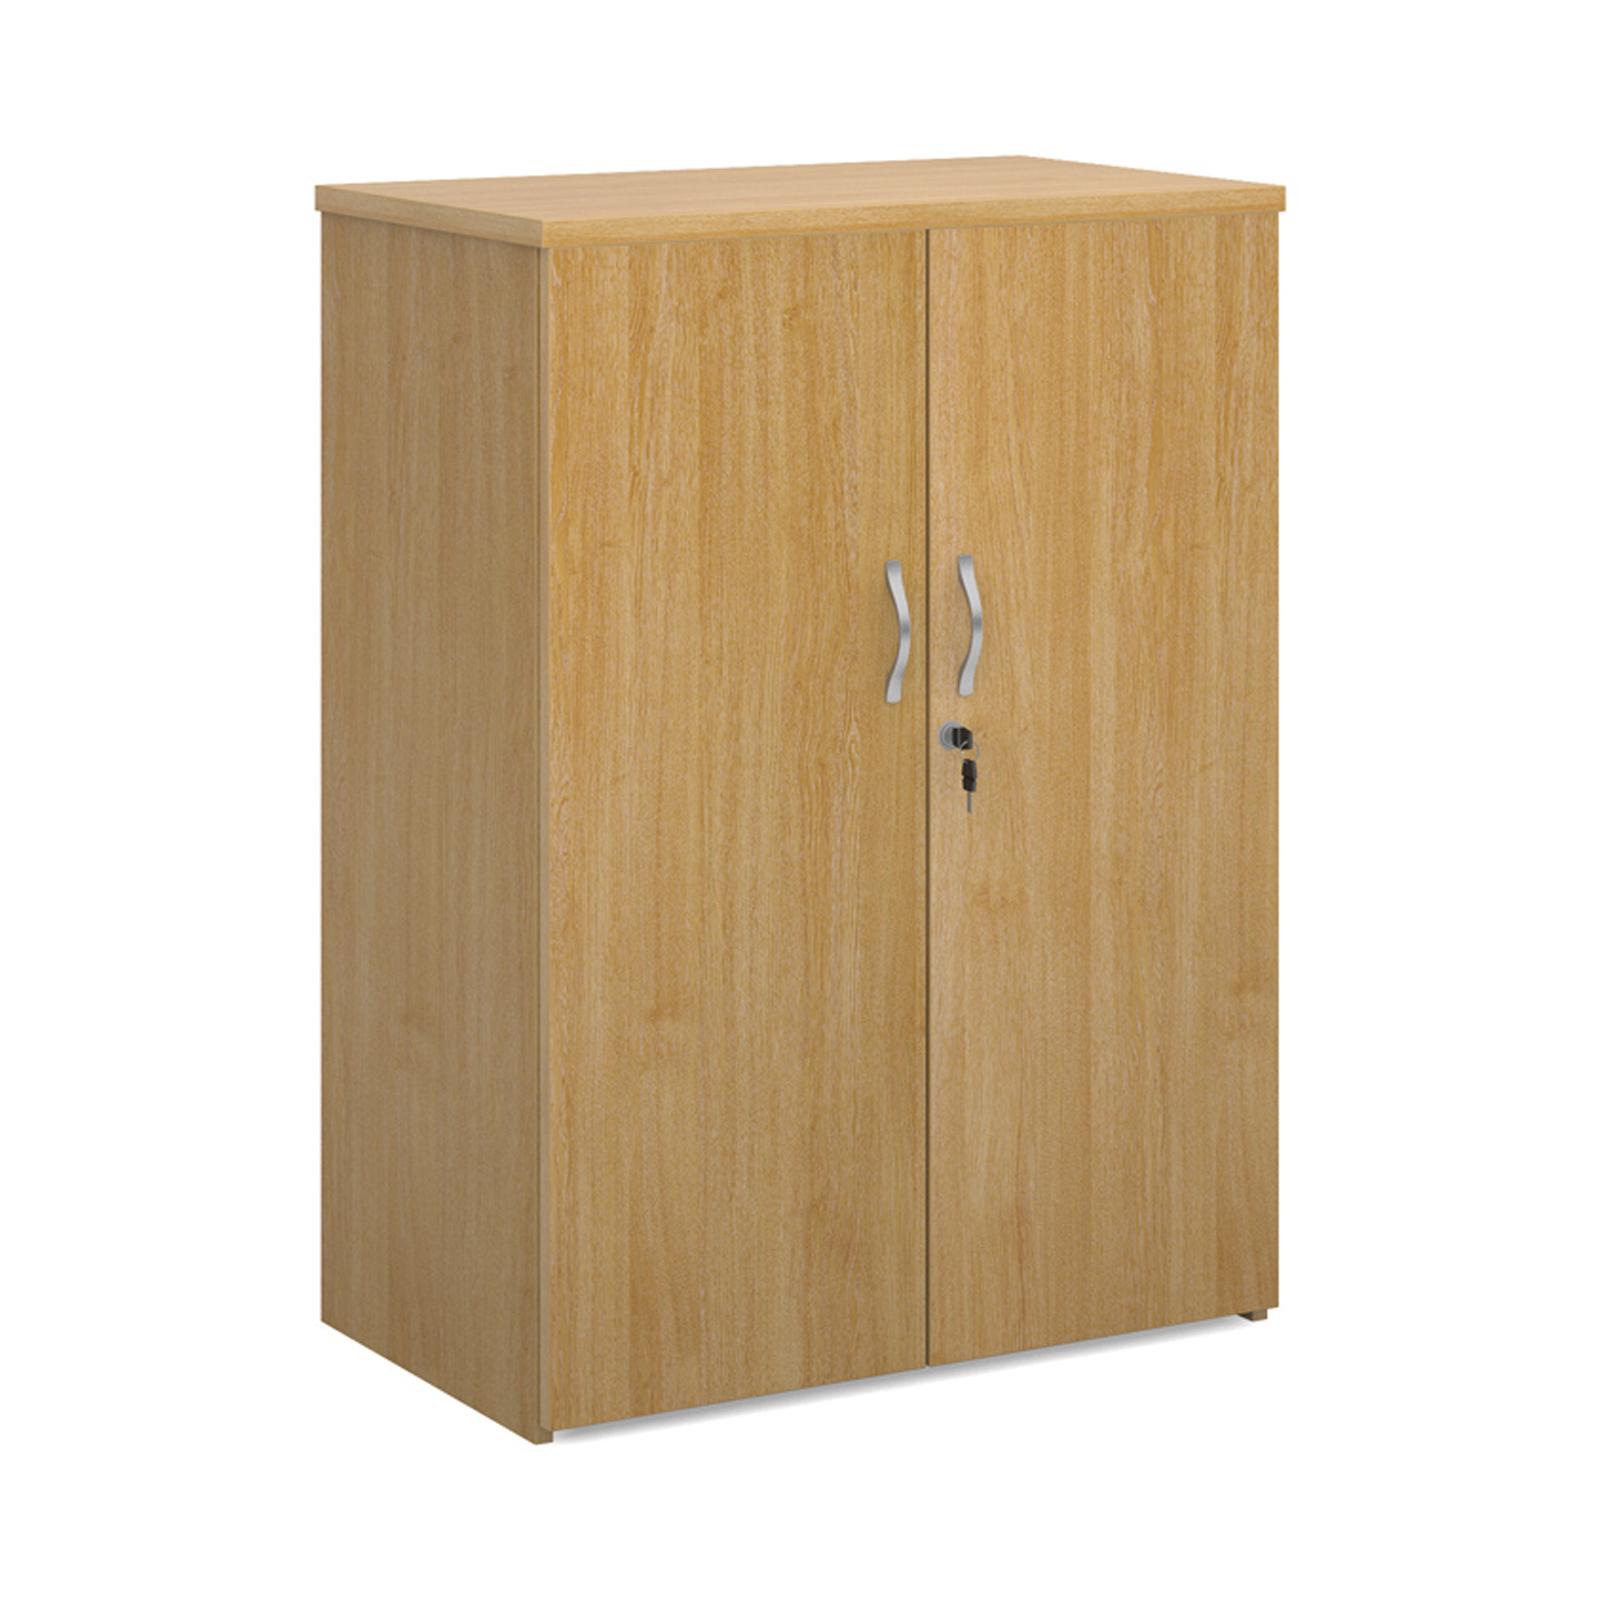 Up to 1200mm High Universal double door cupboard 1090mm high with 2 shelves - oak